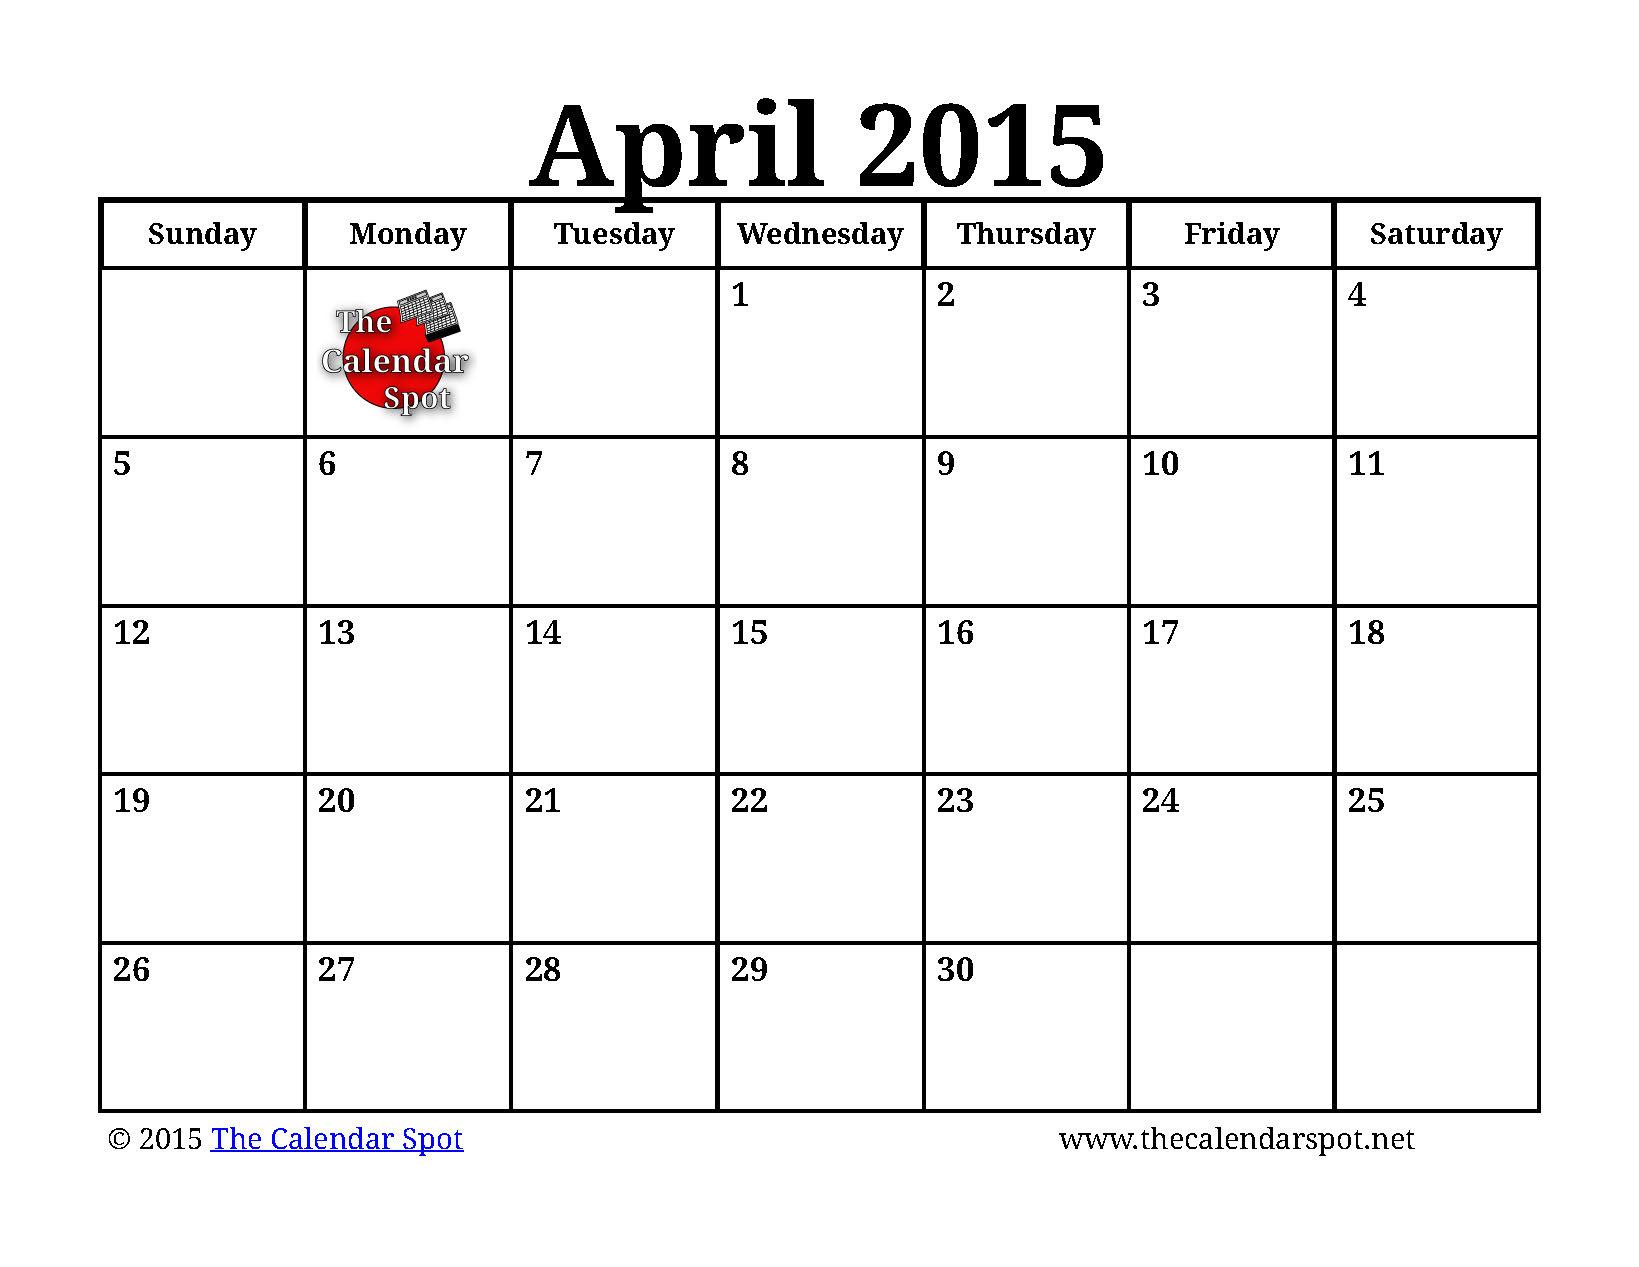 April 2015 Calendar 5 best images of april 2015 calendar printable ...